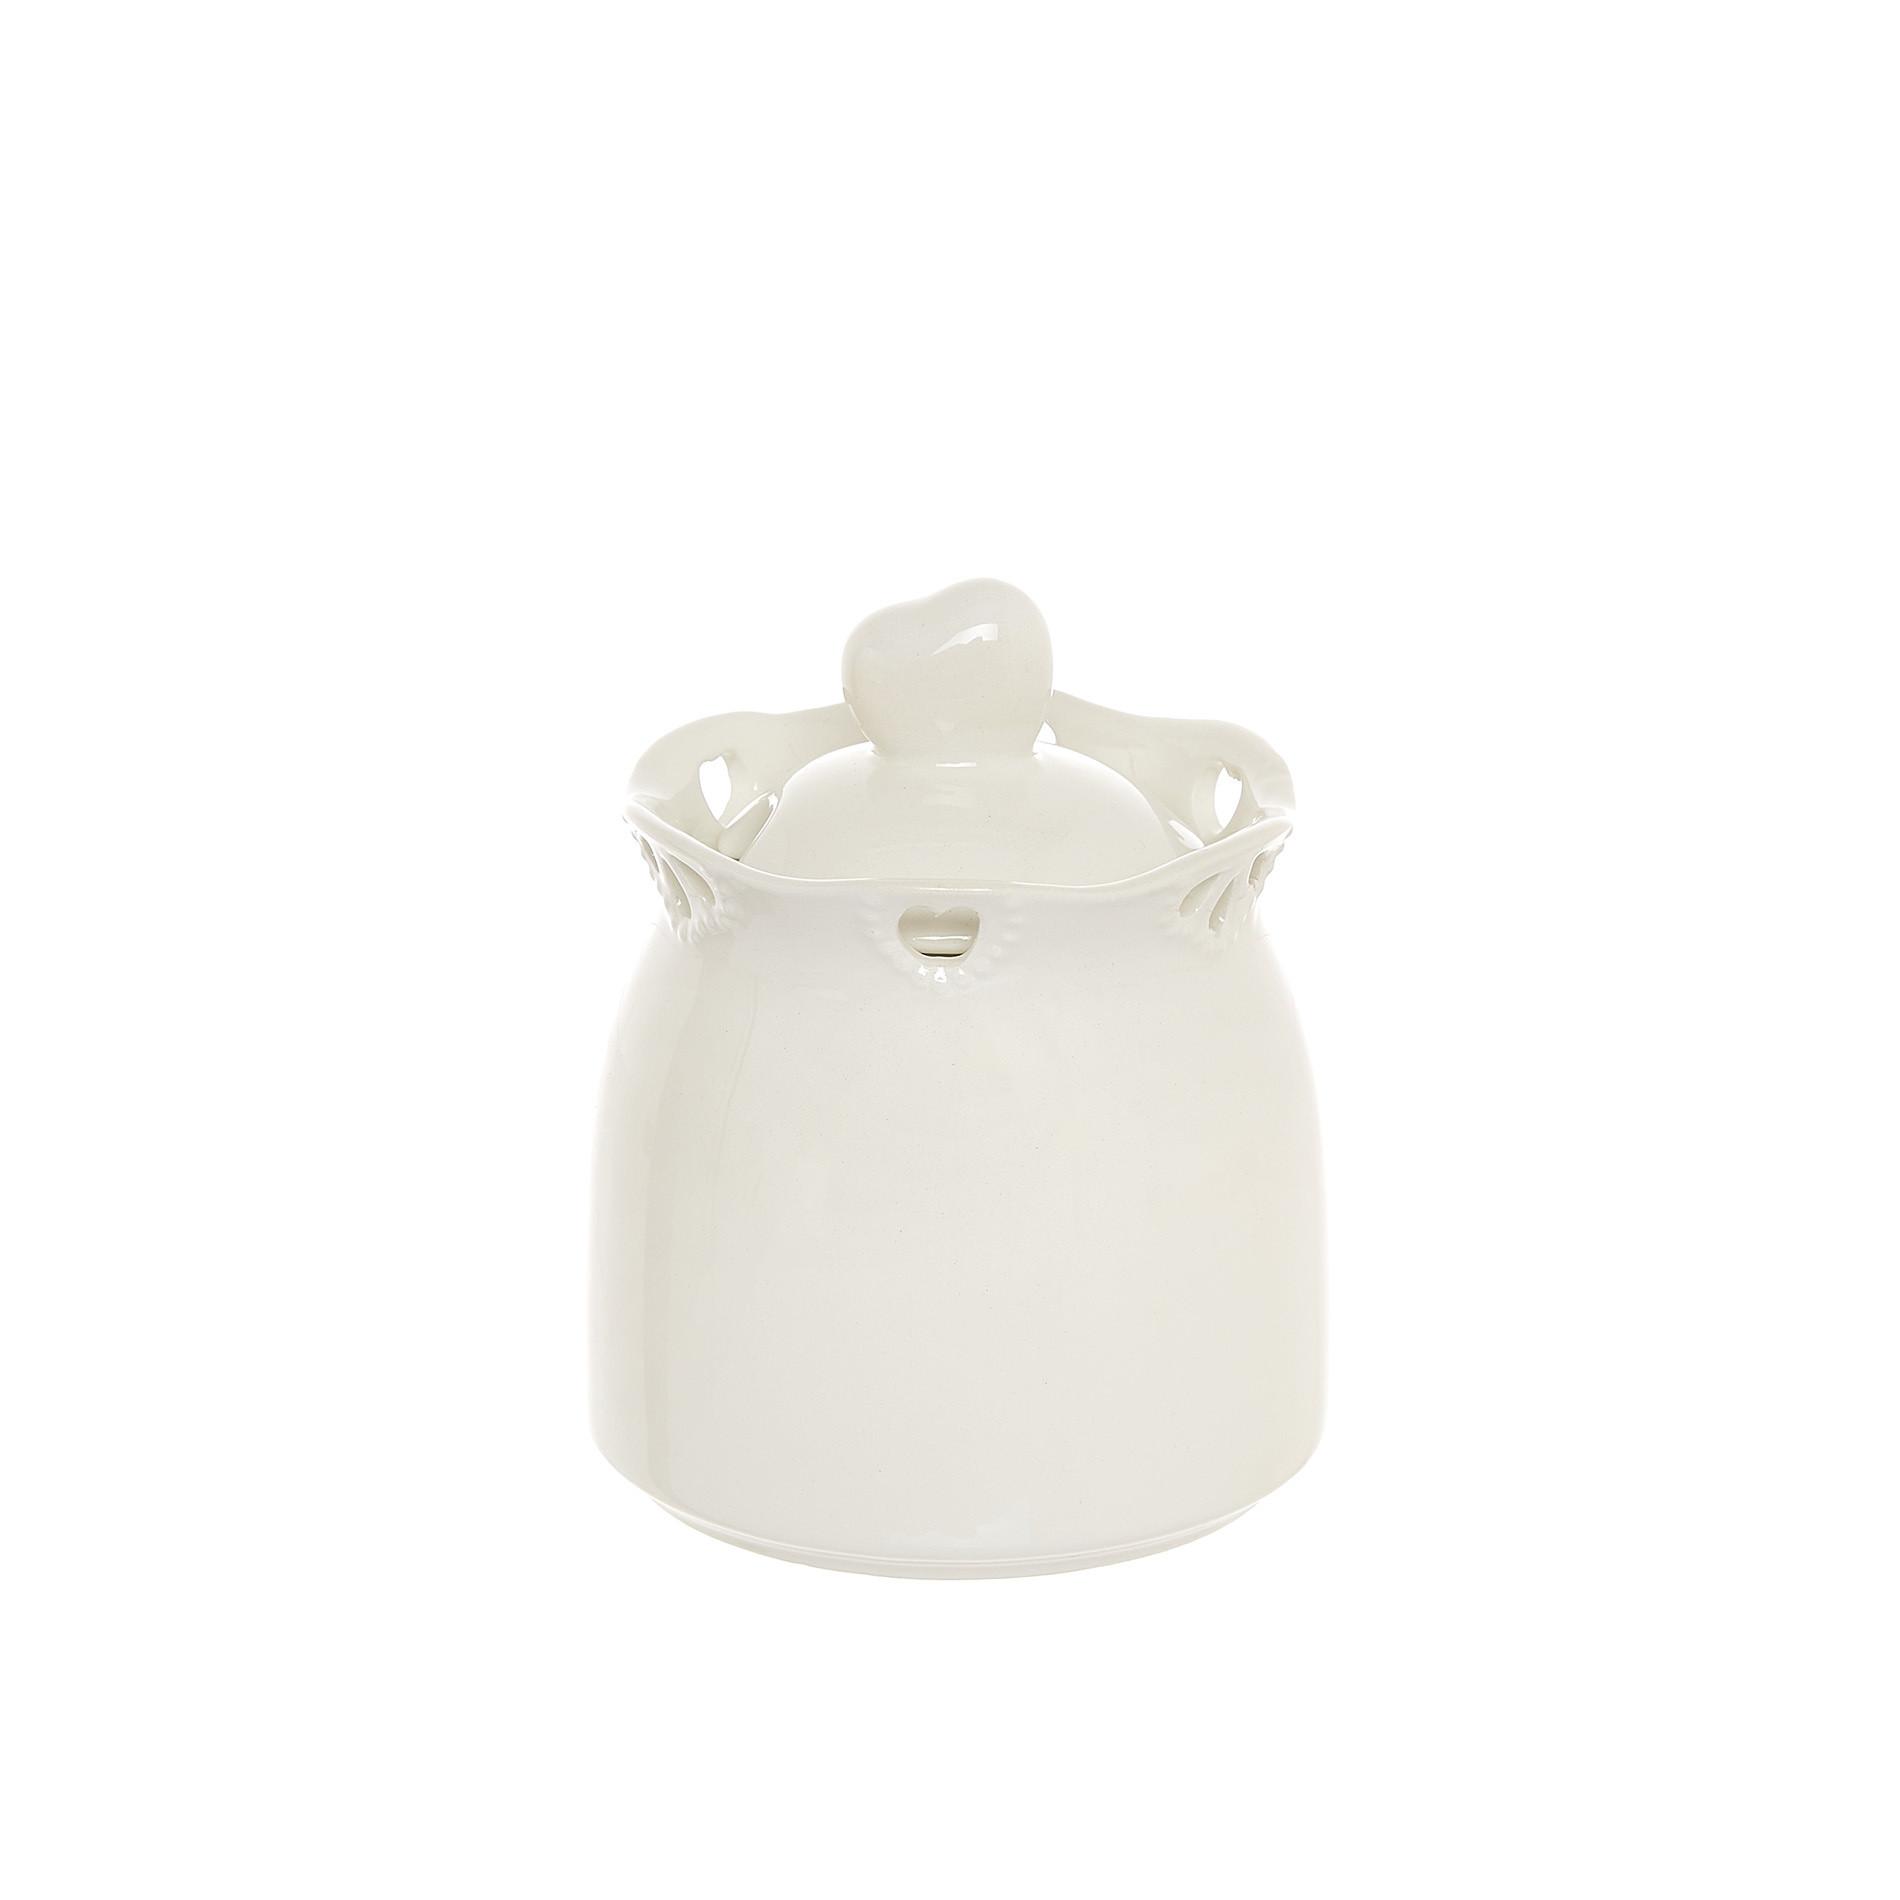 Zuccheriera ceramica traforata, Bianco, large image number 0